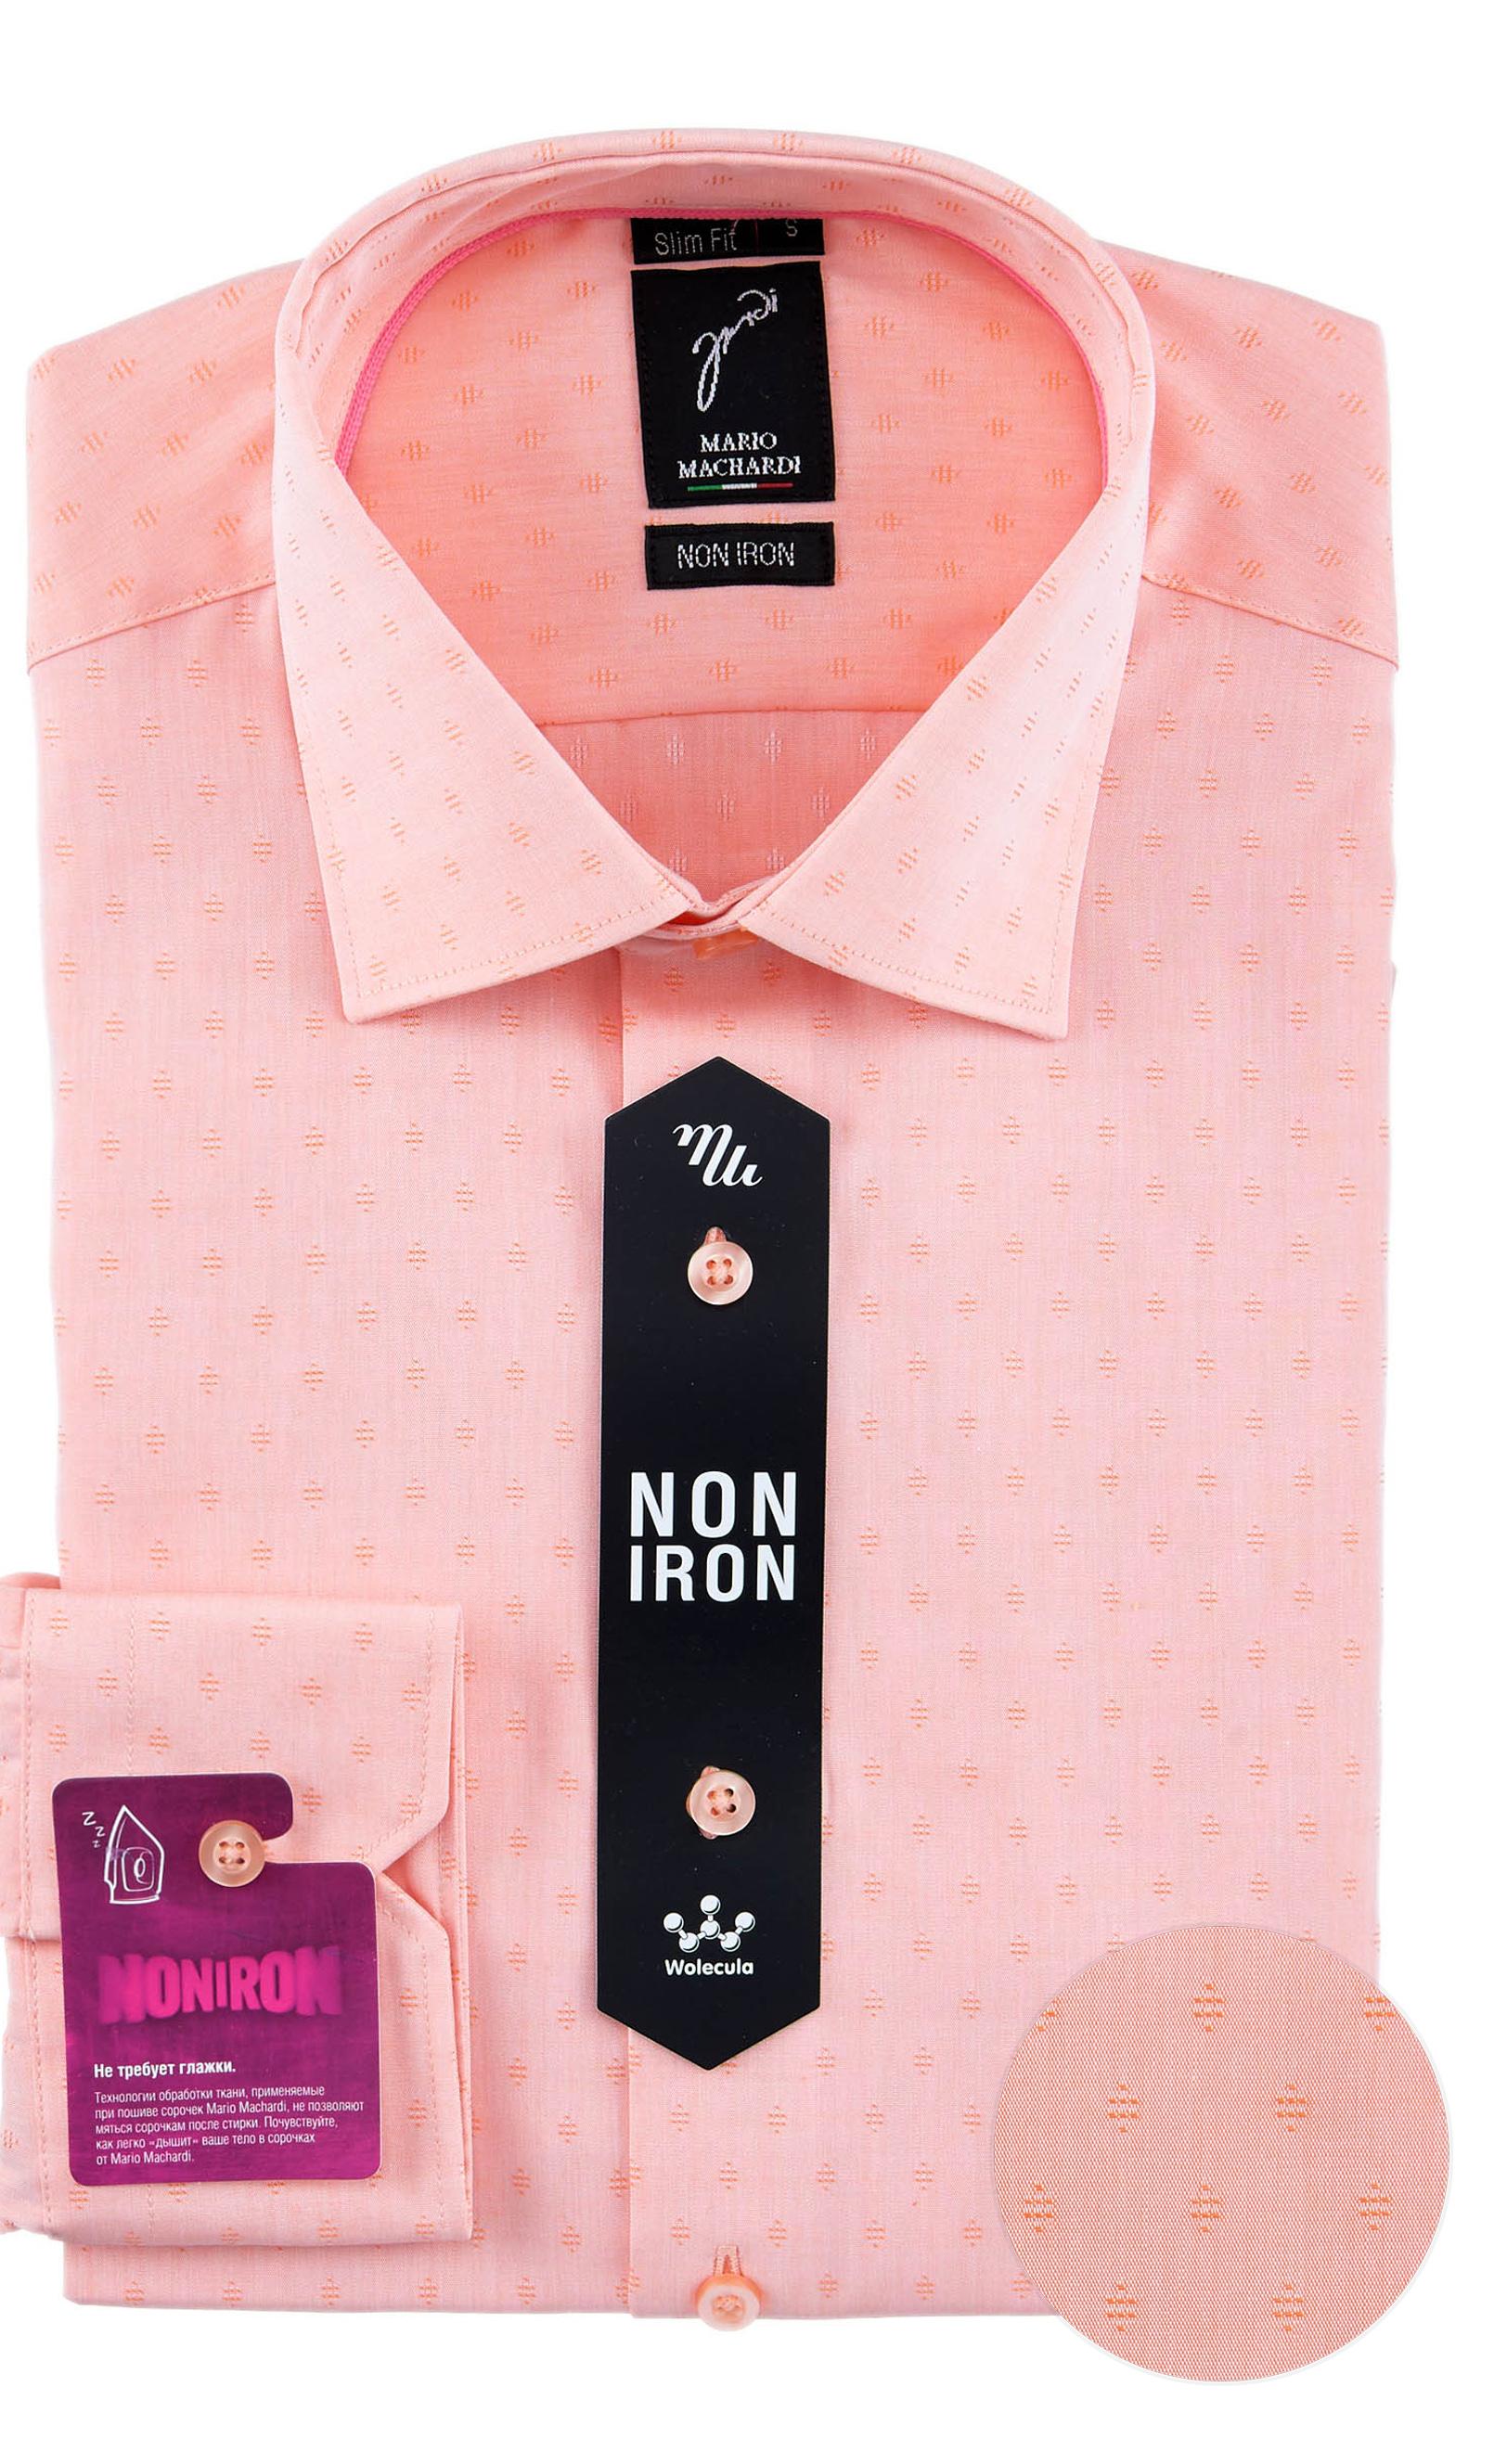 Mario Machardi рубашки NON IRON (SLIM FIT) арт.- СФ439251К-1